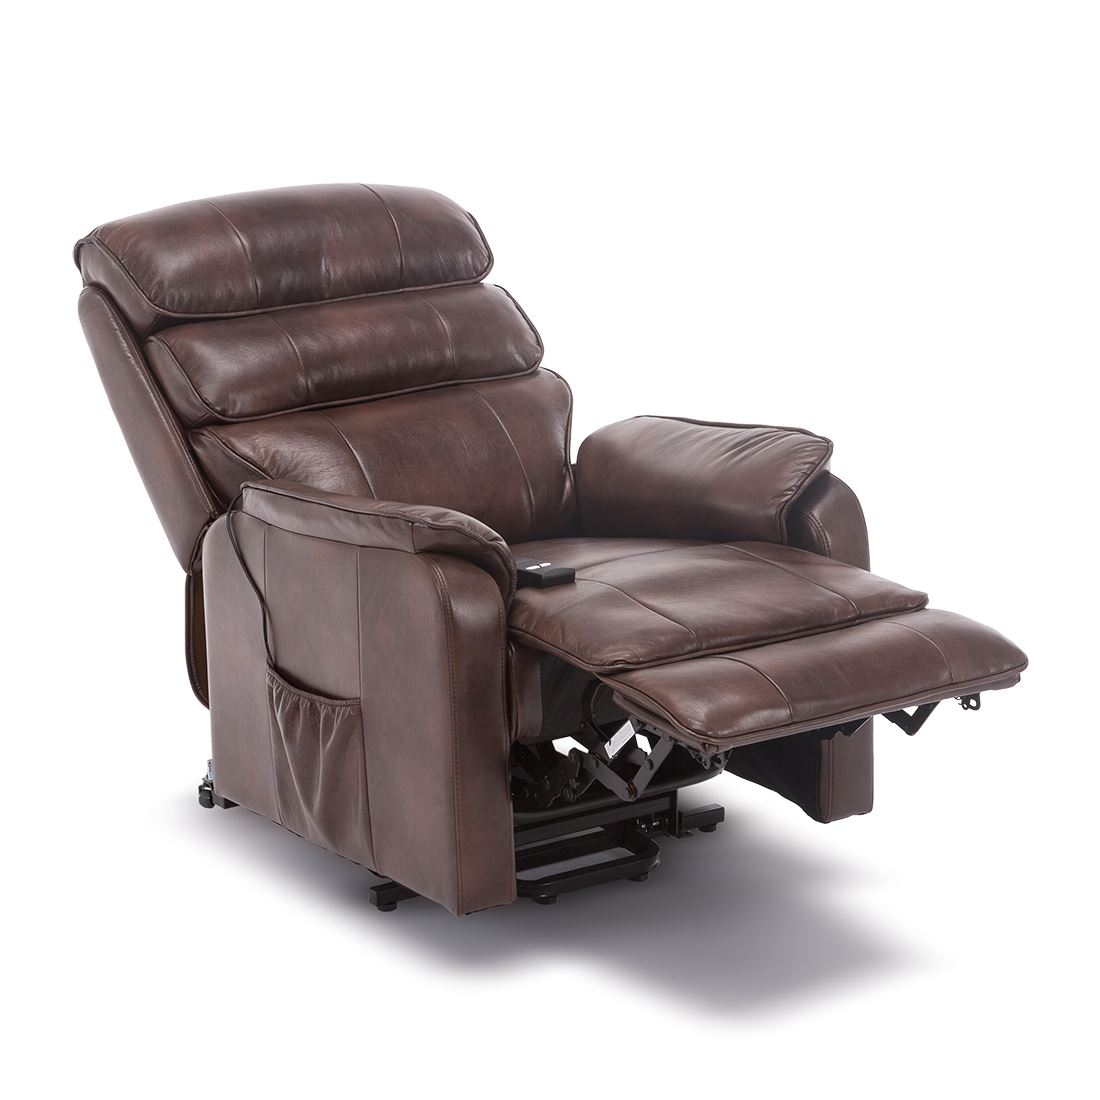 Prime Details About Buckingham Electric Rise Recliner Leather Air Riser Sofa Armchair Lounge Chair Creativecarmelina Interior Chair Design Creativecarmelinacom